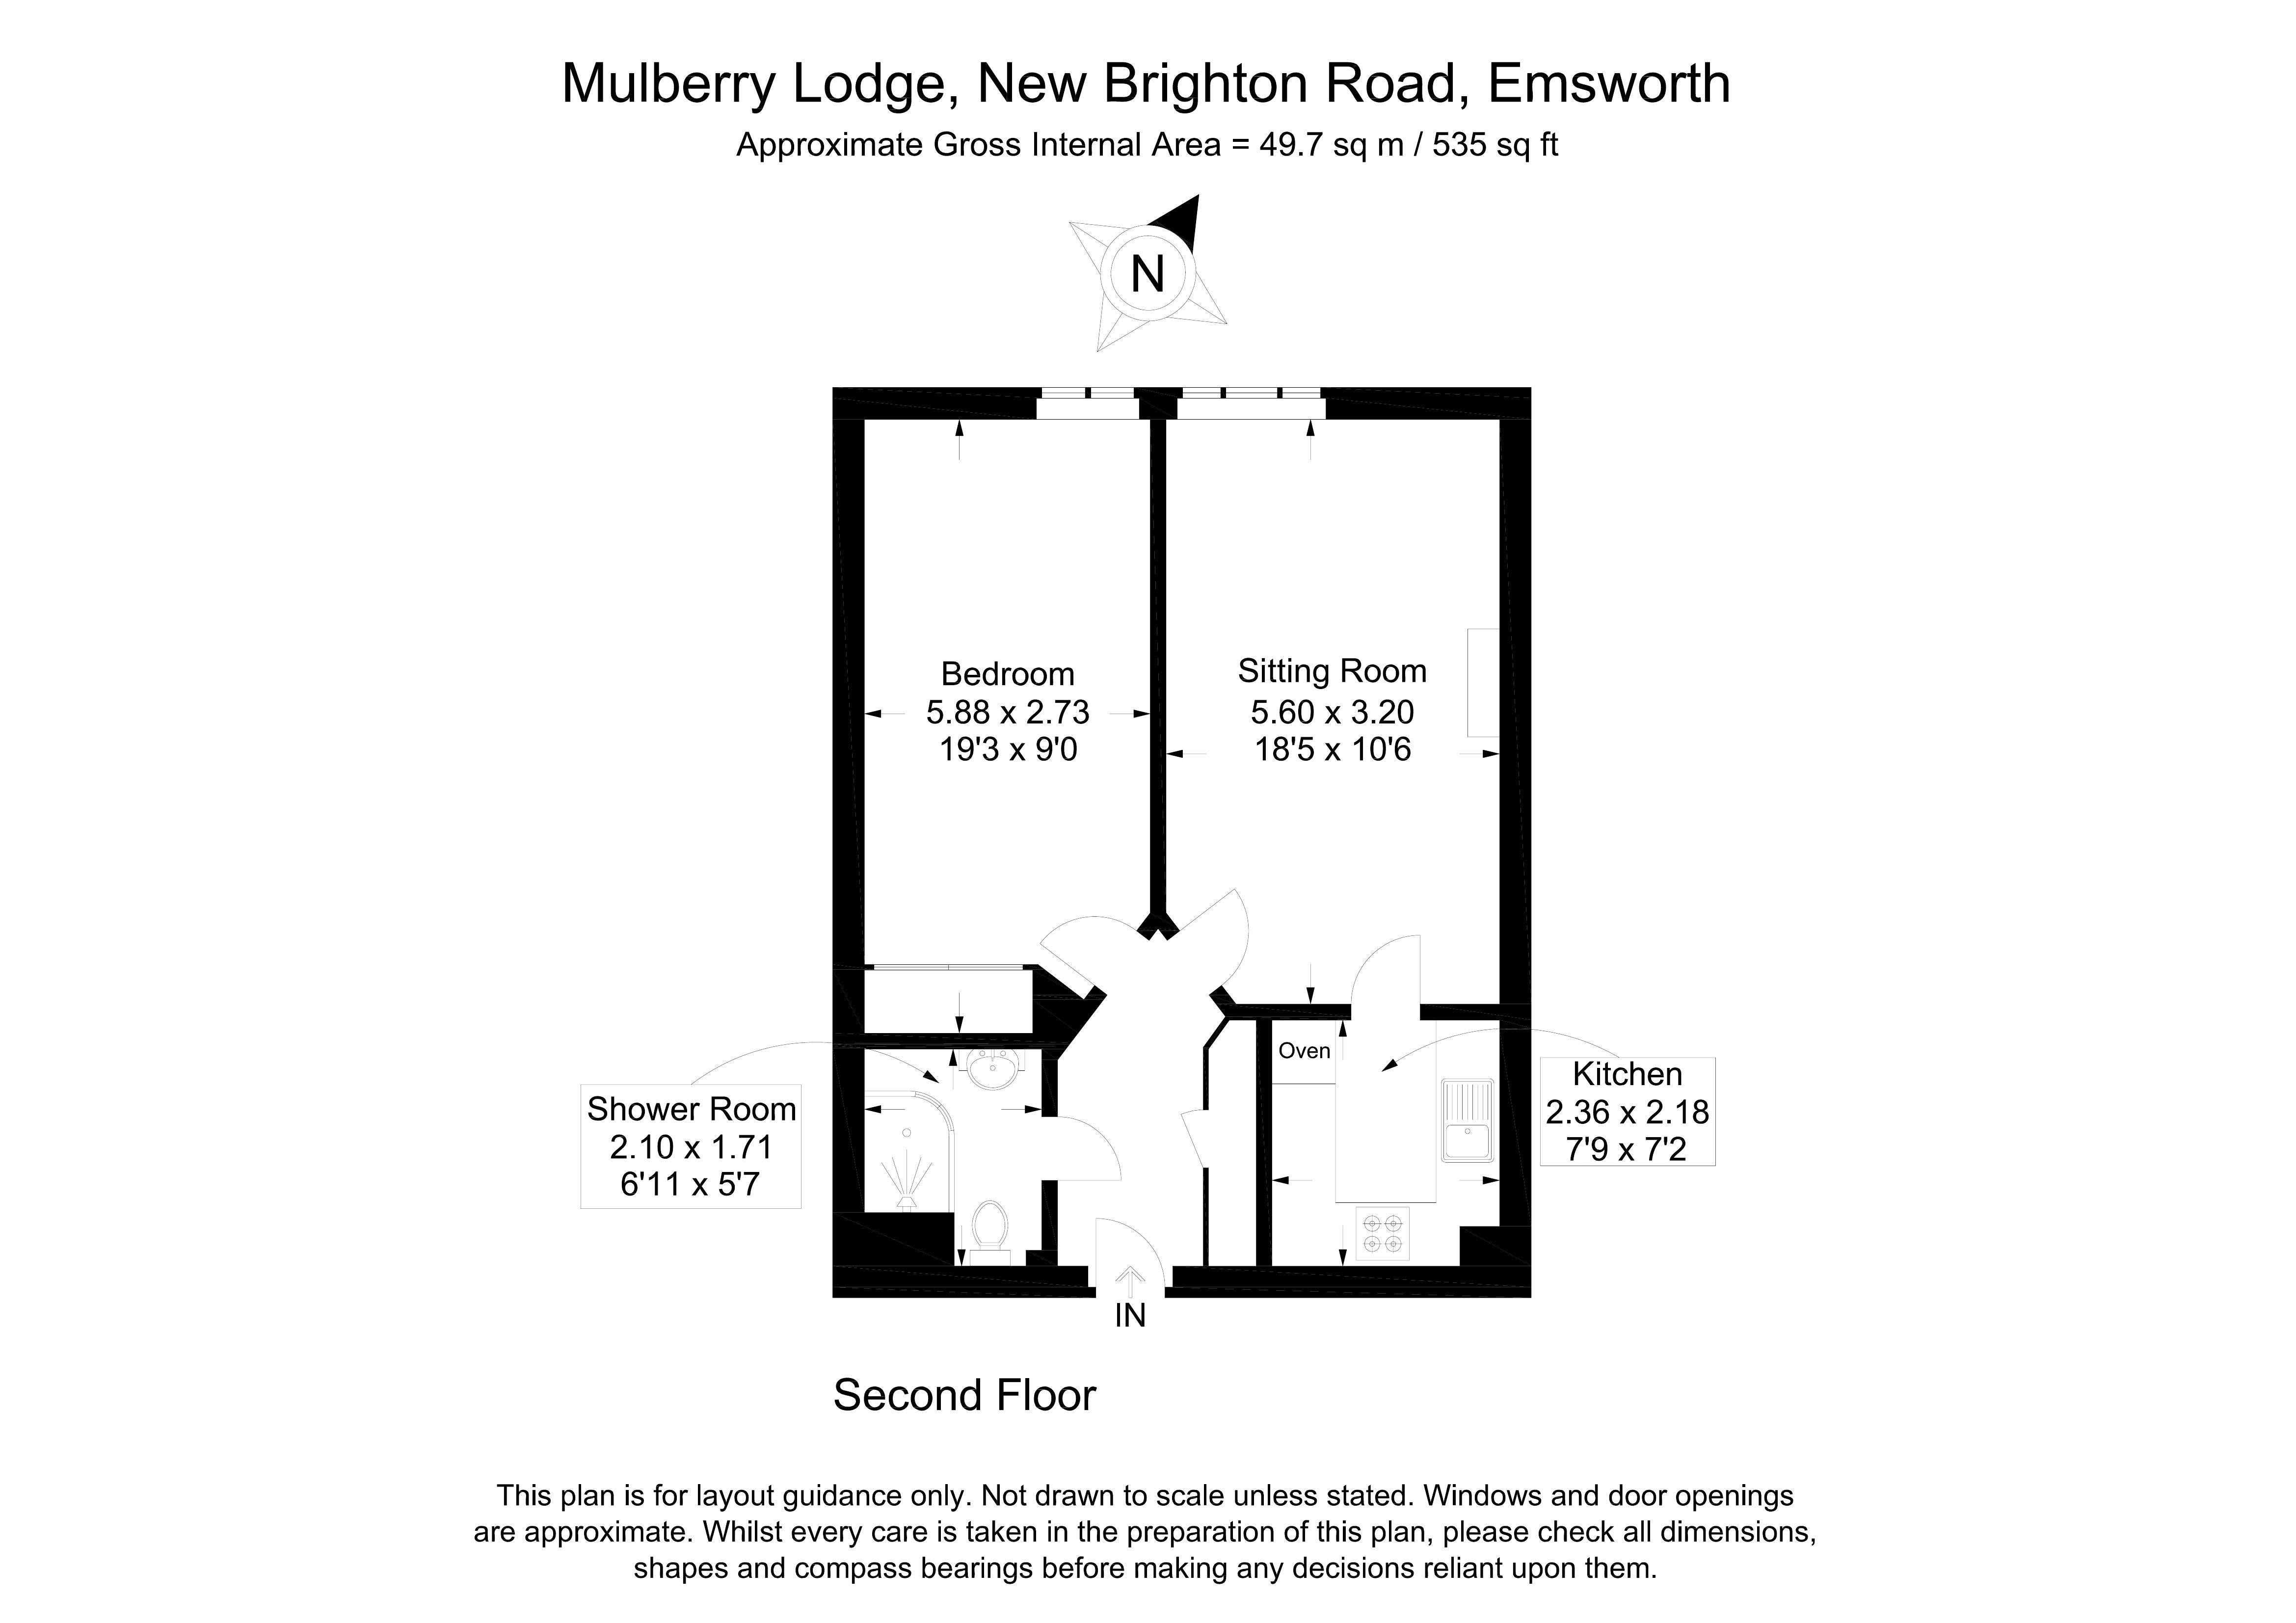 New Brighton Road